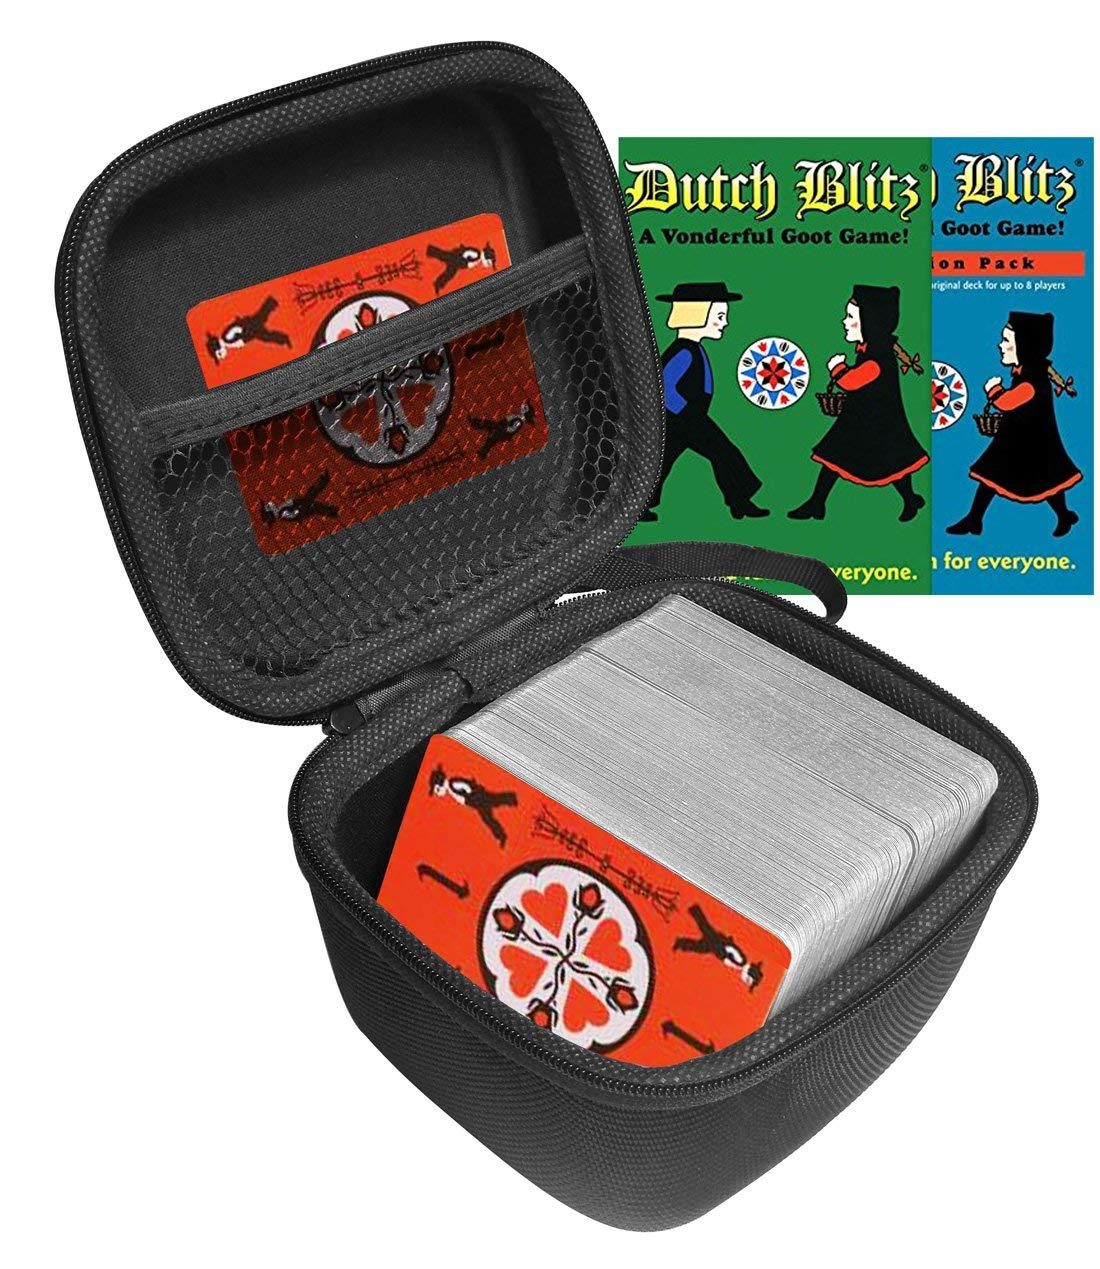 eda3cfd70f6 FitSand(TM) Dutch Blitz Original and Expansion Pack Set Card Game ...